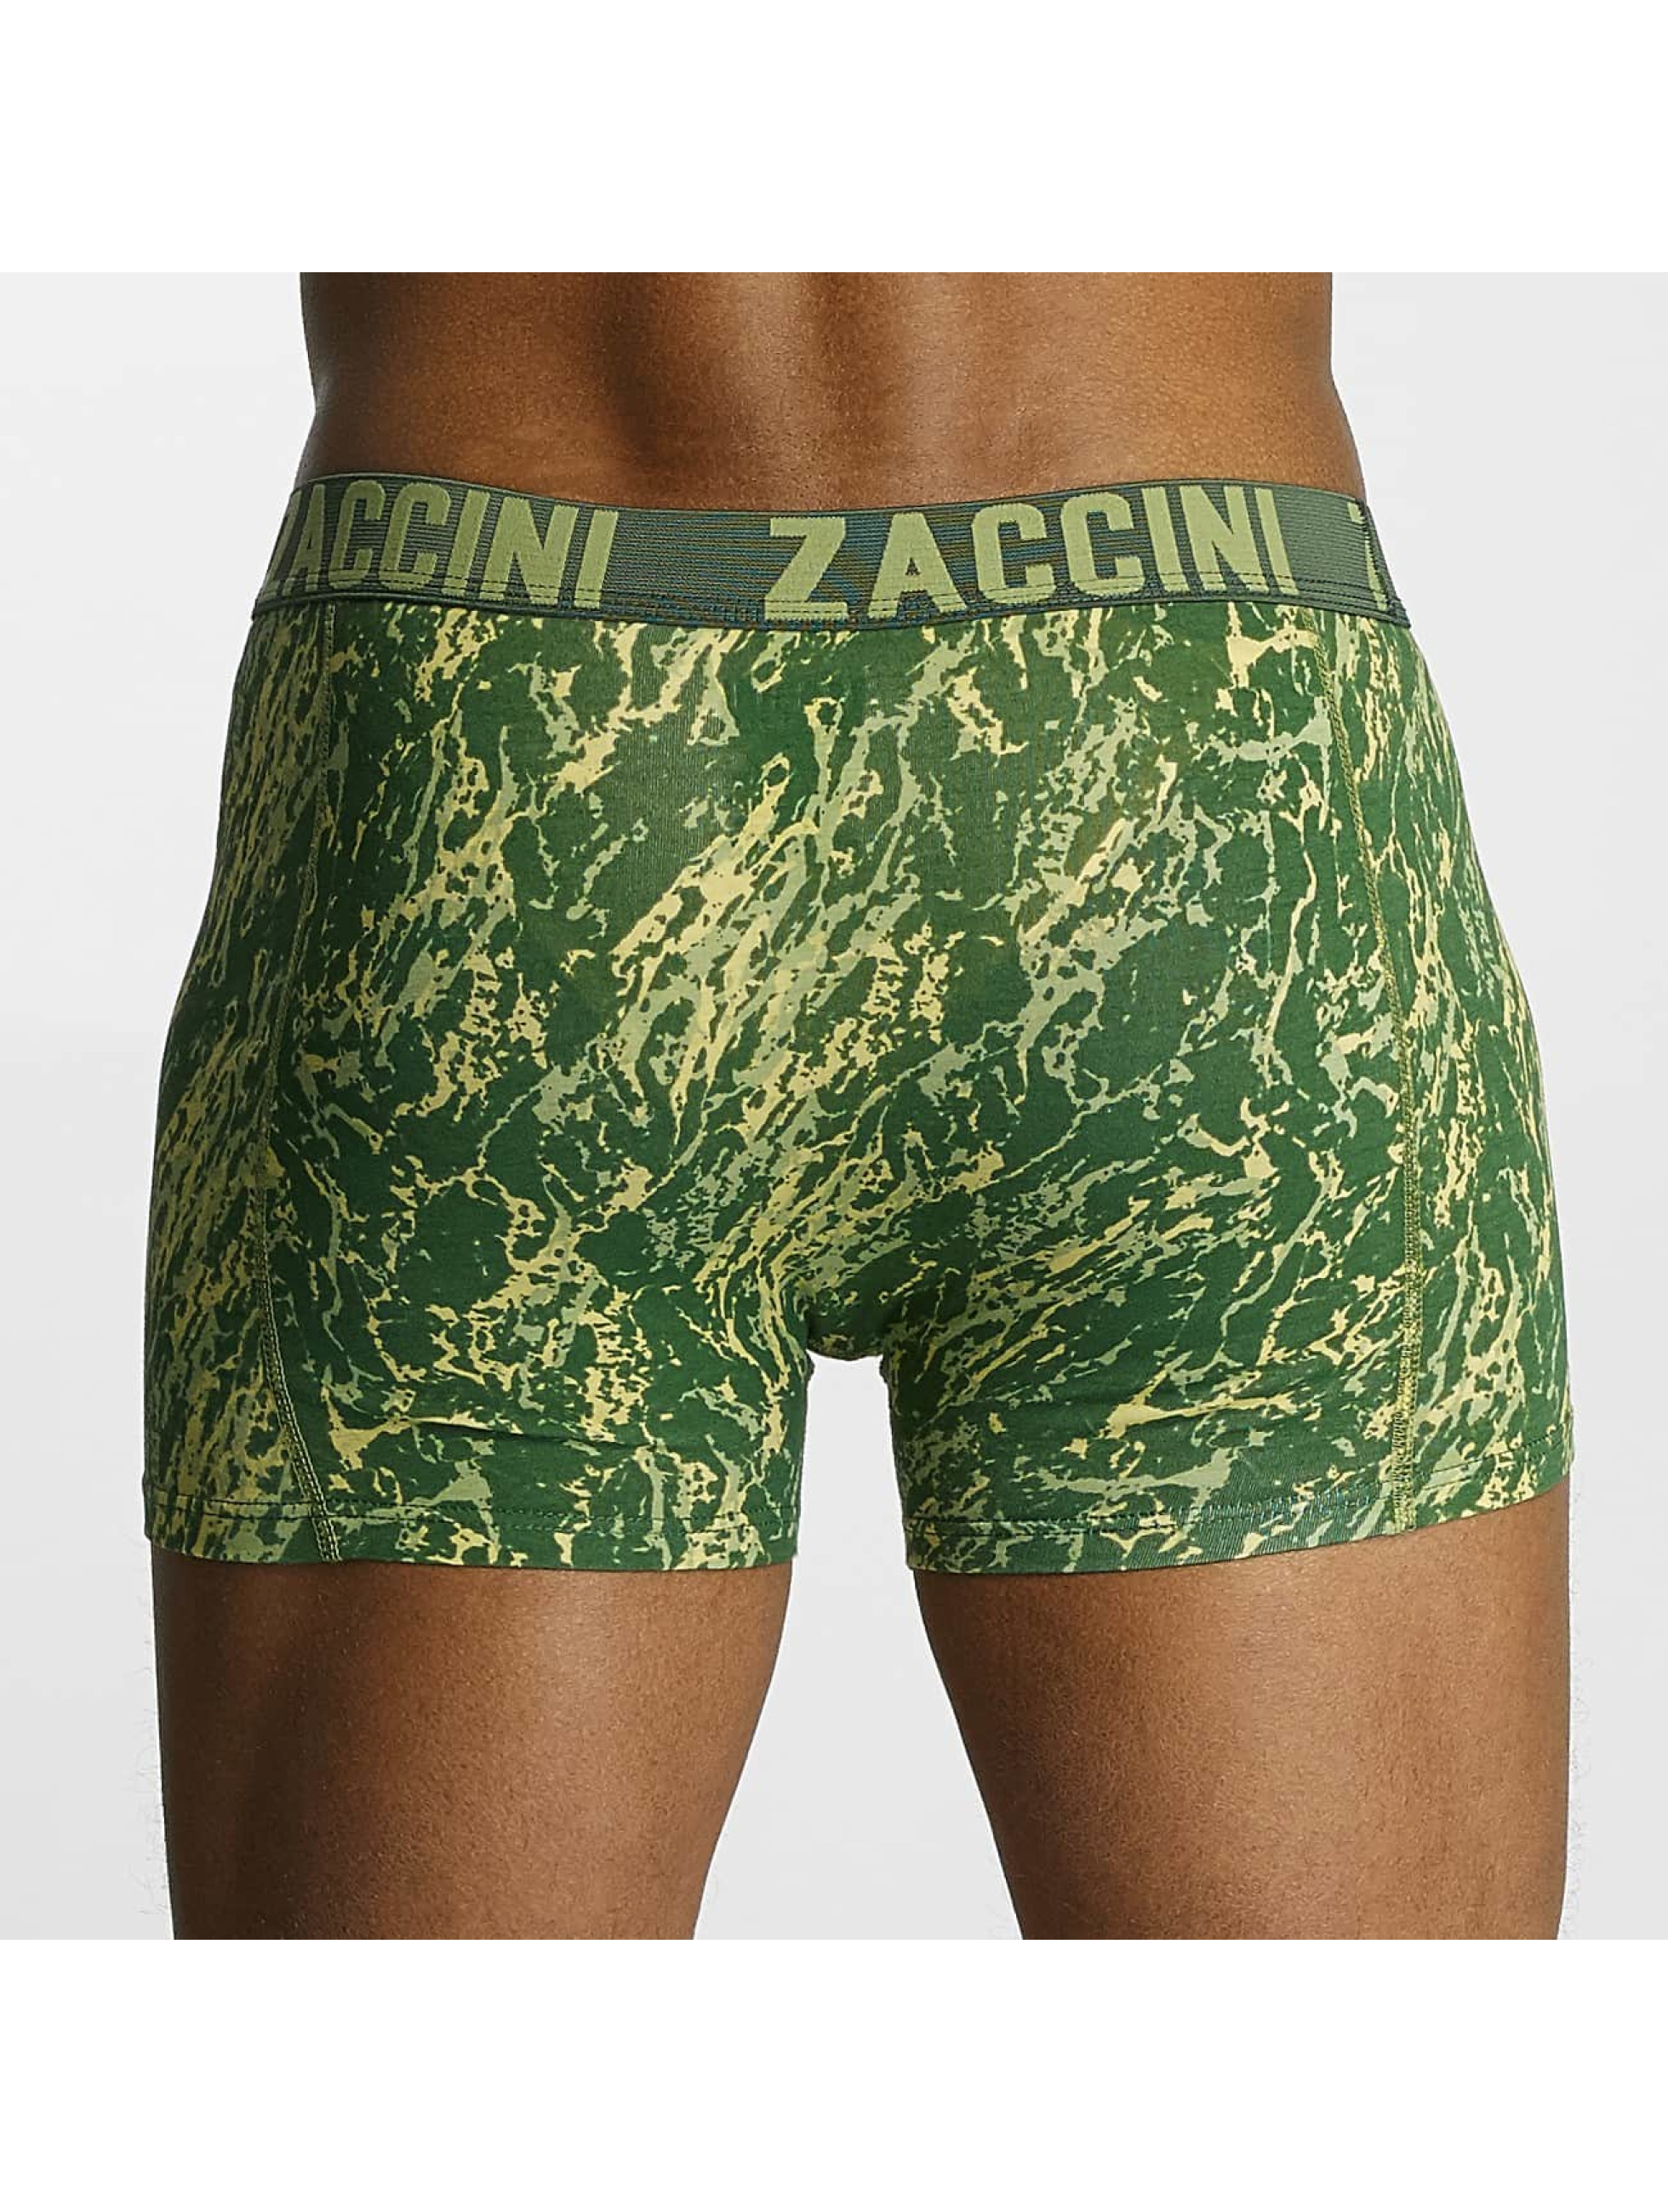 Zaccini Семейные трусы Mineral зеленый